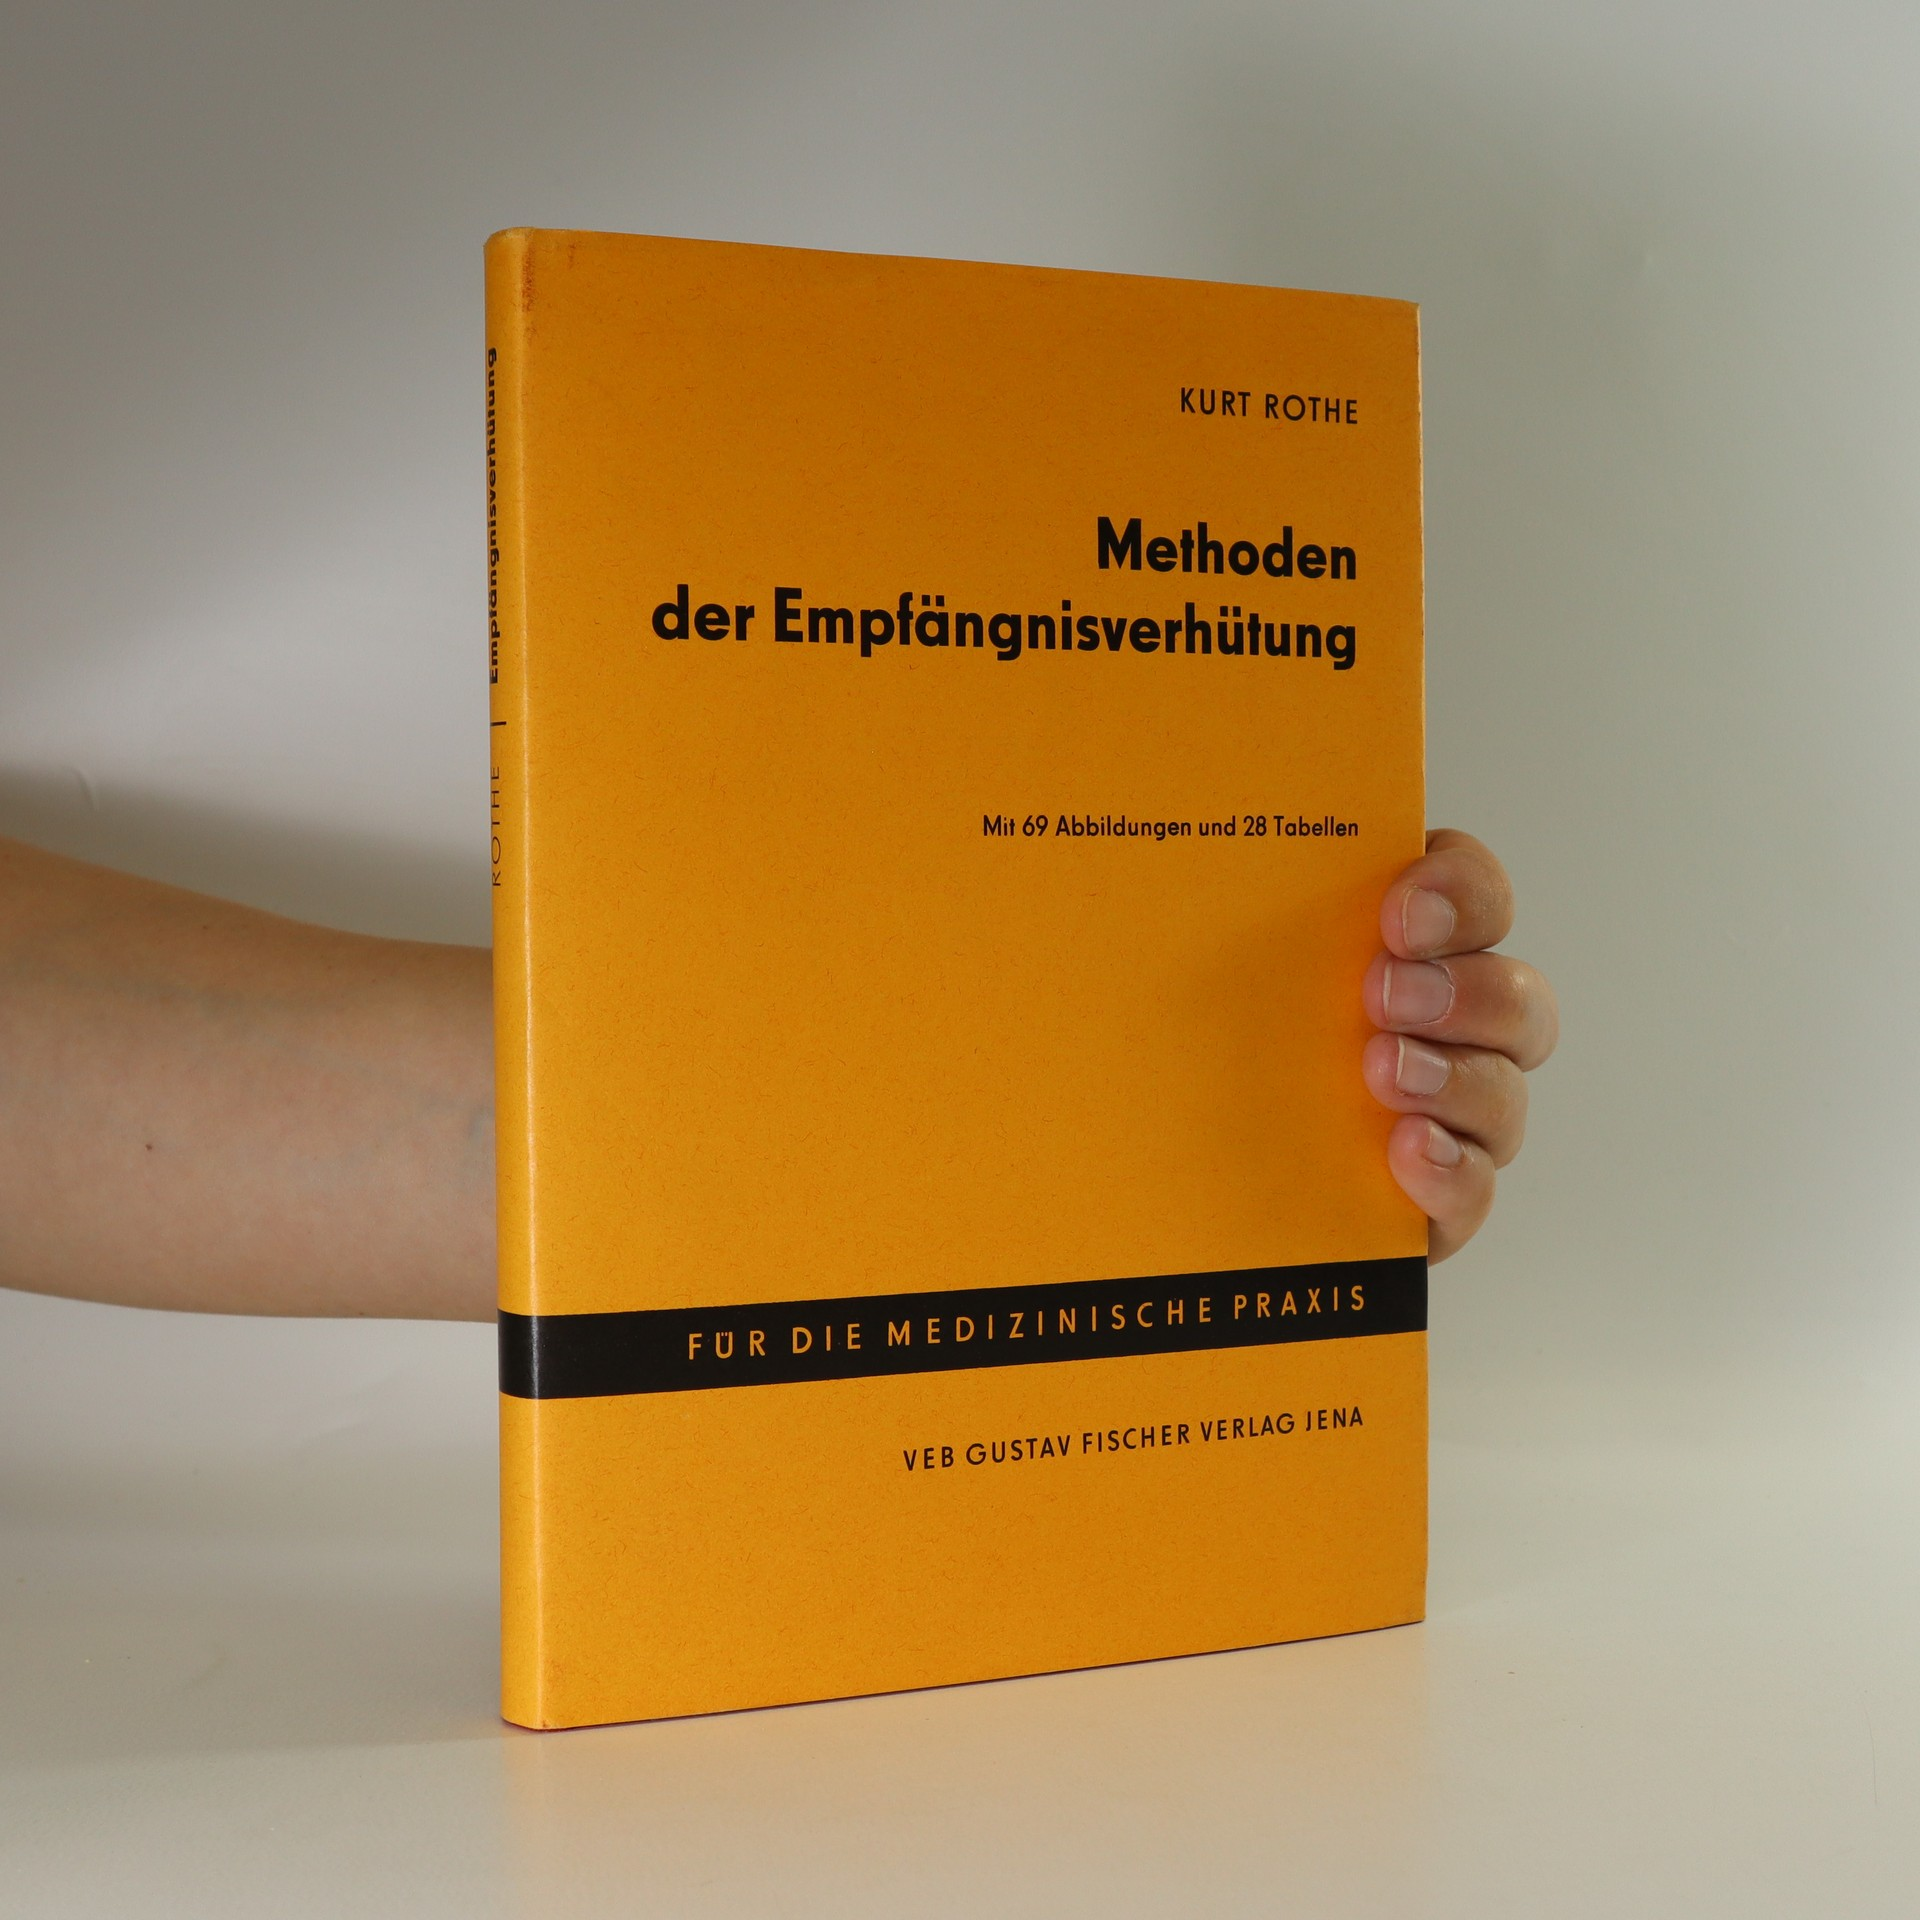 antikvární kniha Methoden der Empfängnisverhütung, 1973